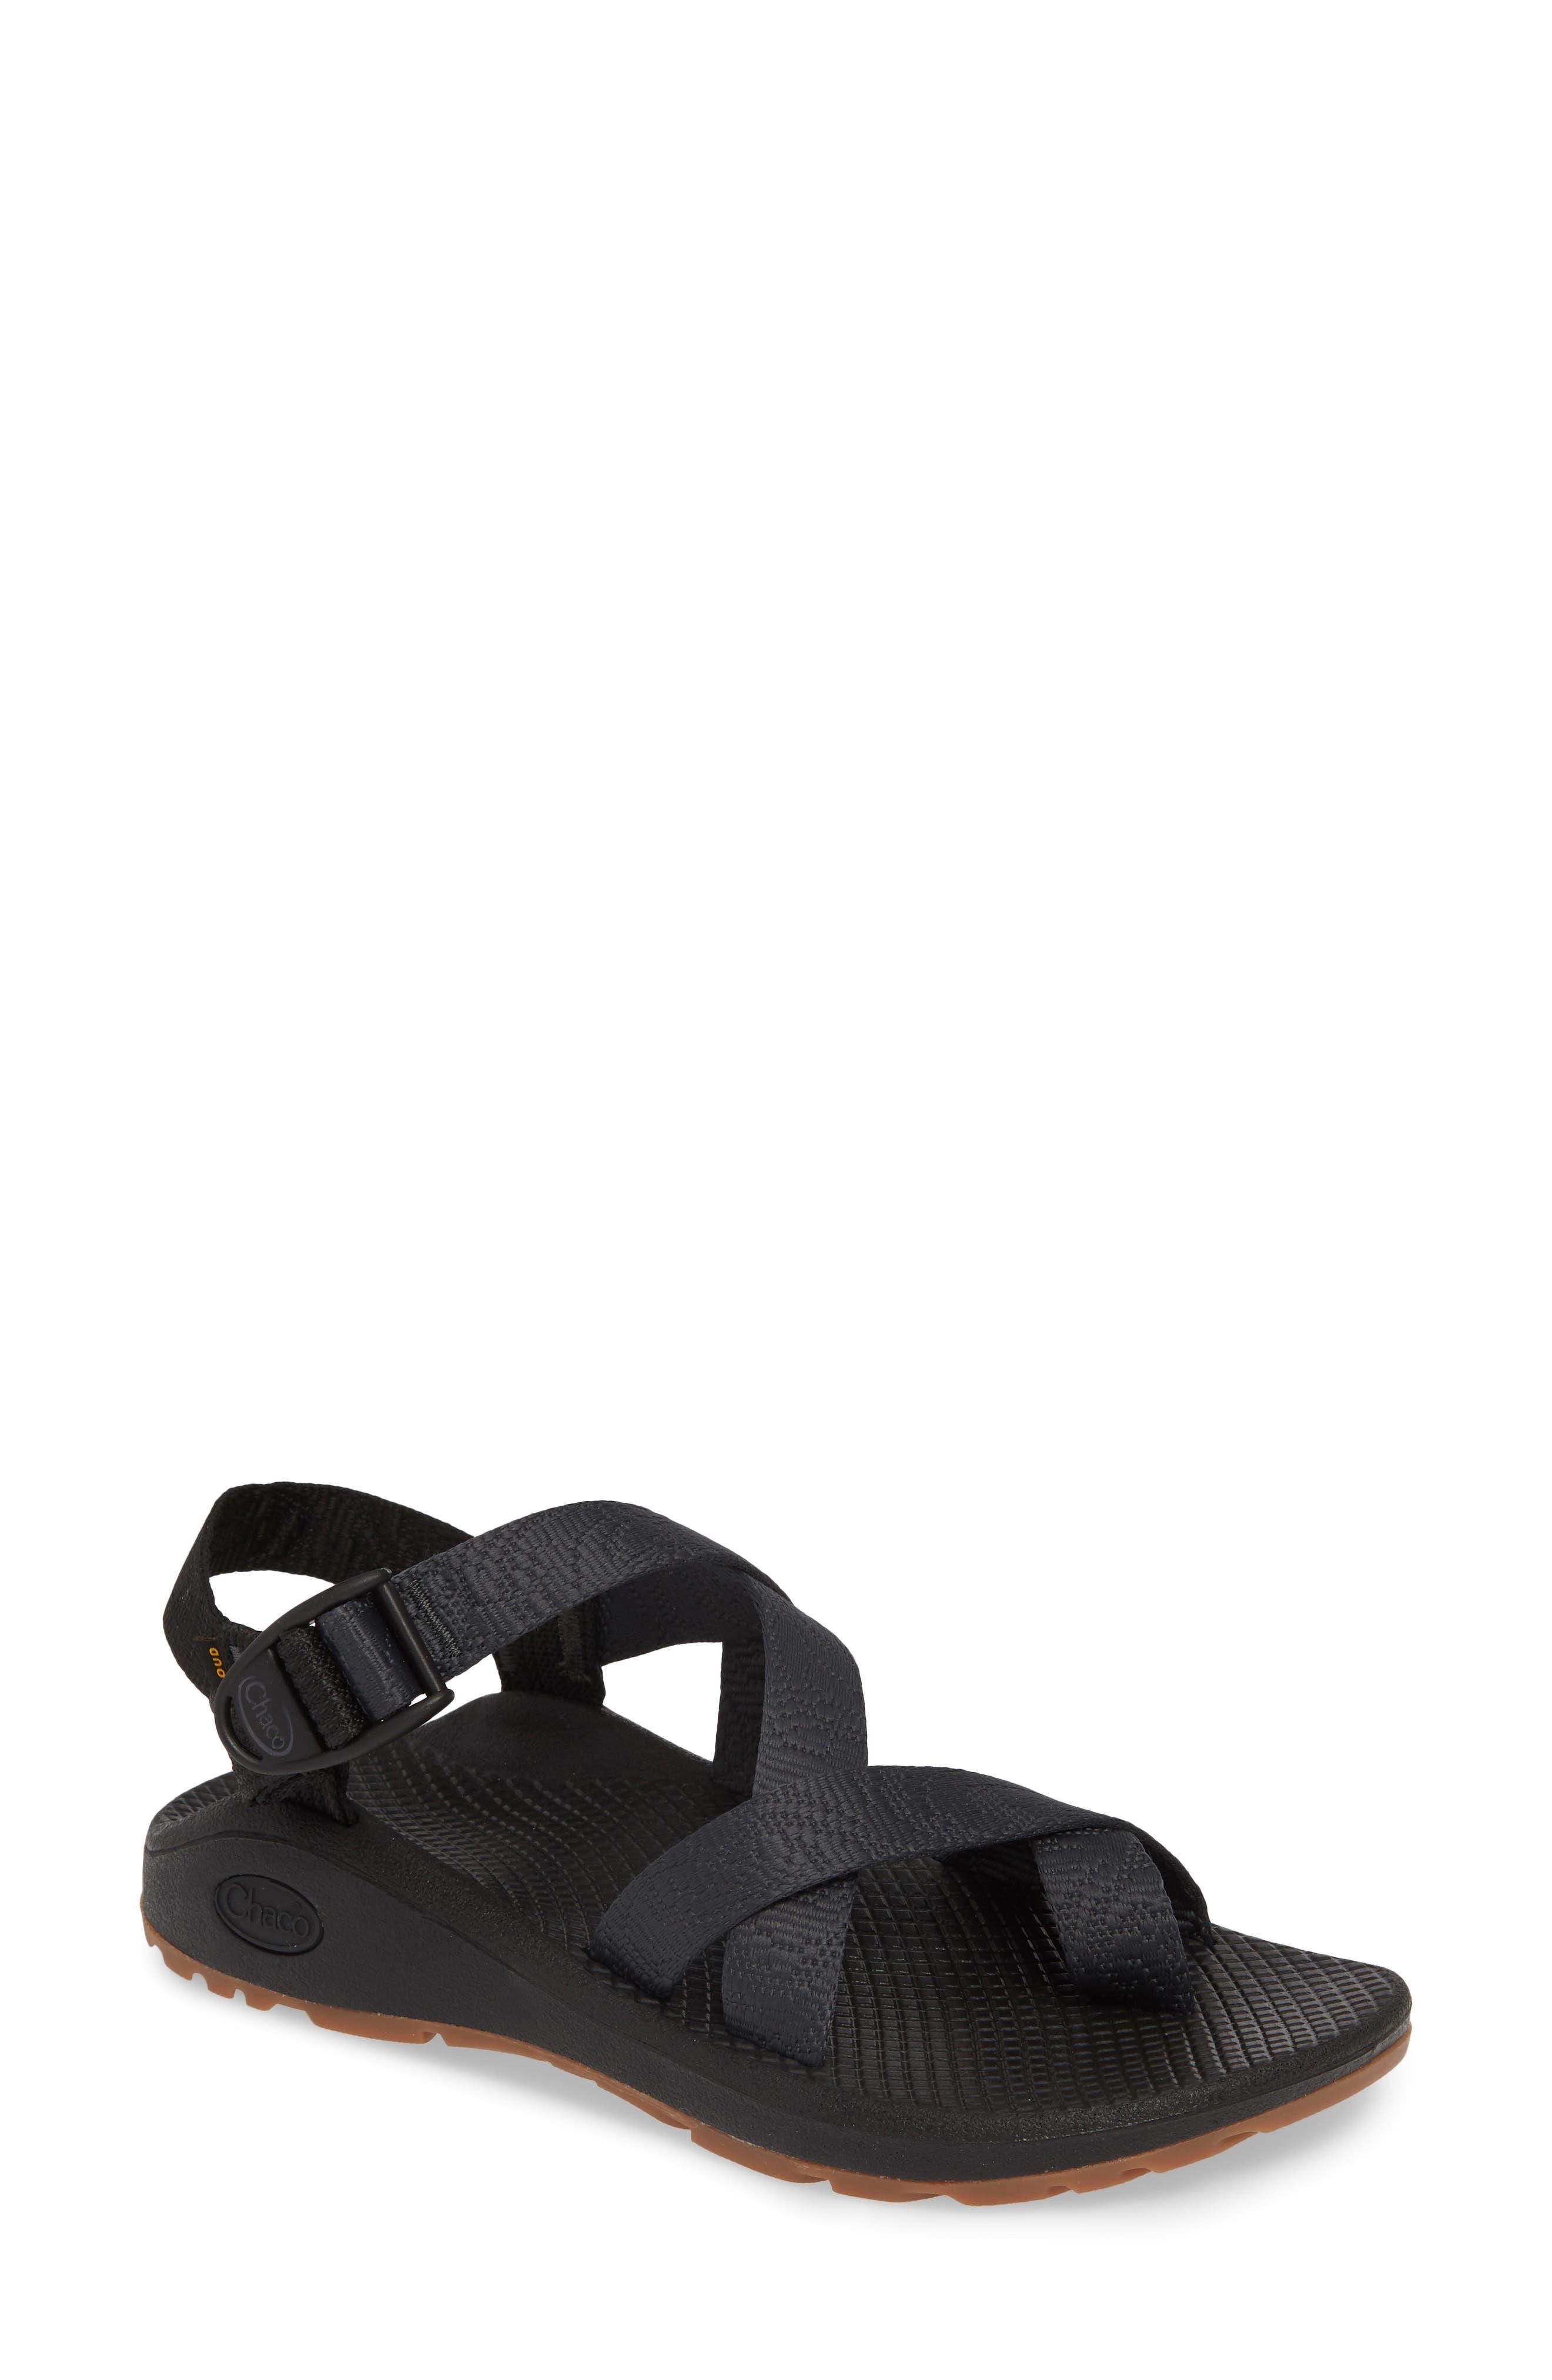 1d8330503bf0 Womens chaco sandals nordstrom jpg 2640x4048 Chacos sandal royal